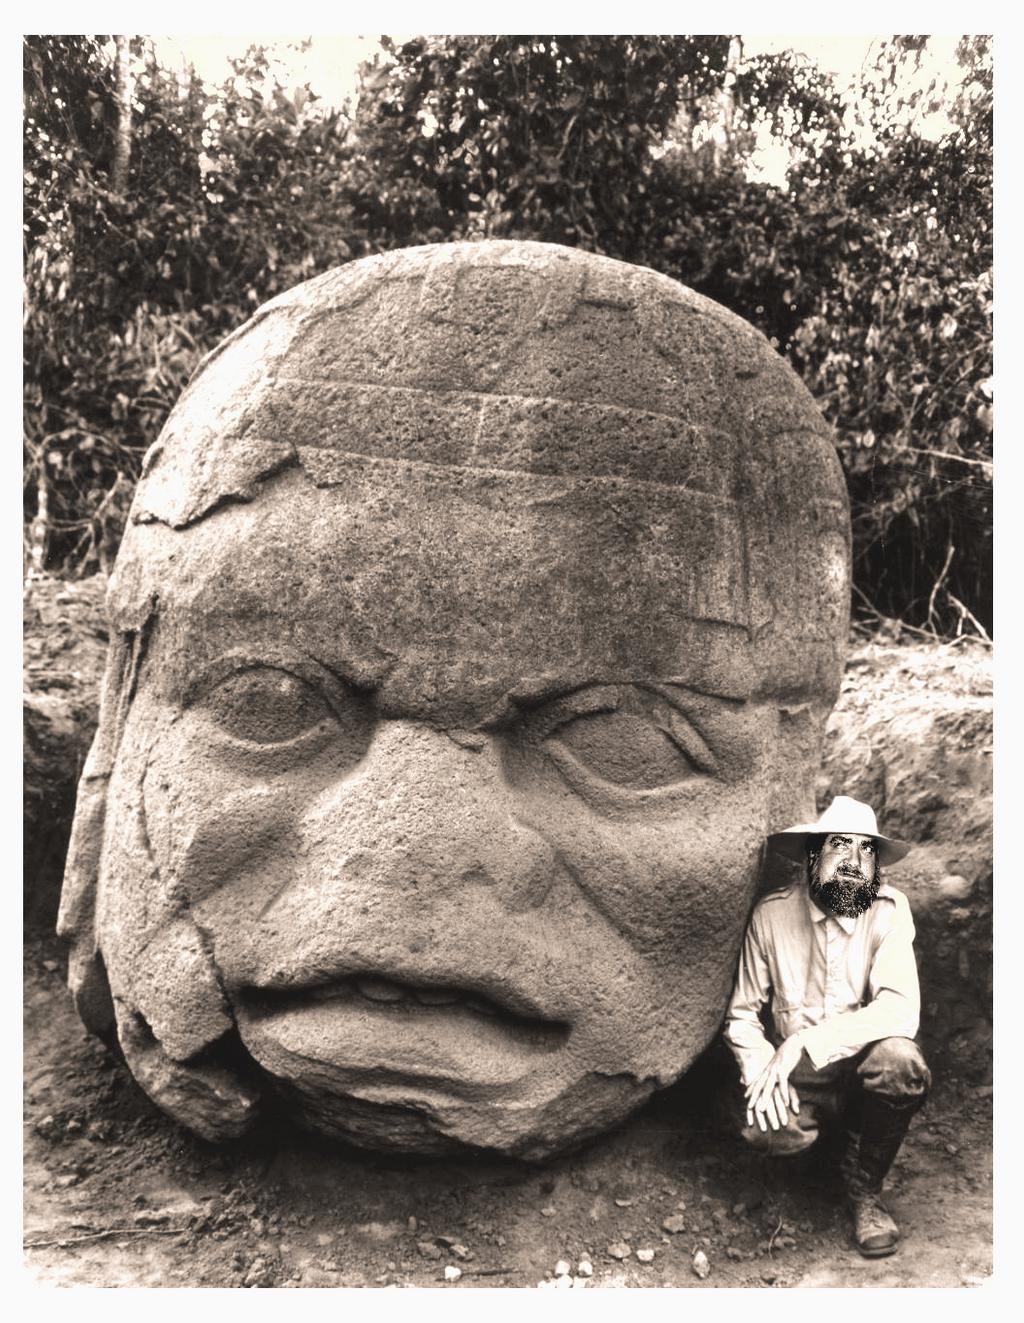 Great Explorer VIII (Giant head)